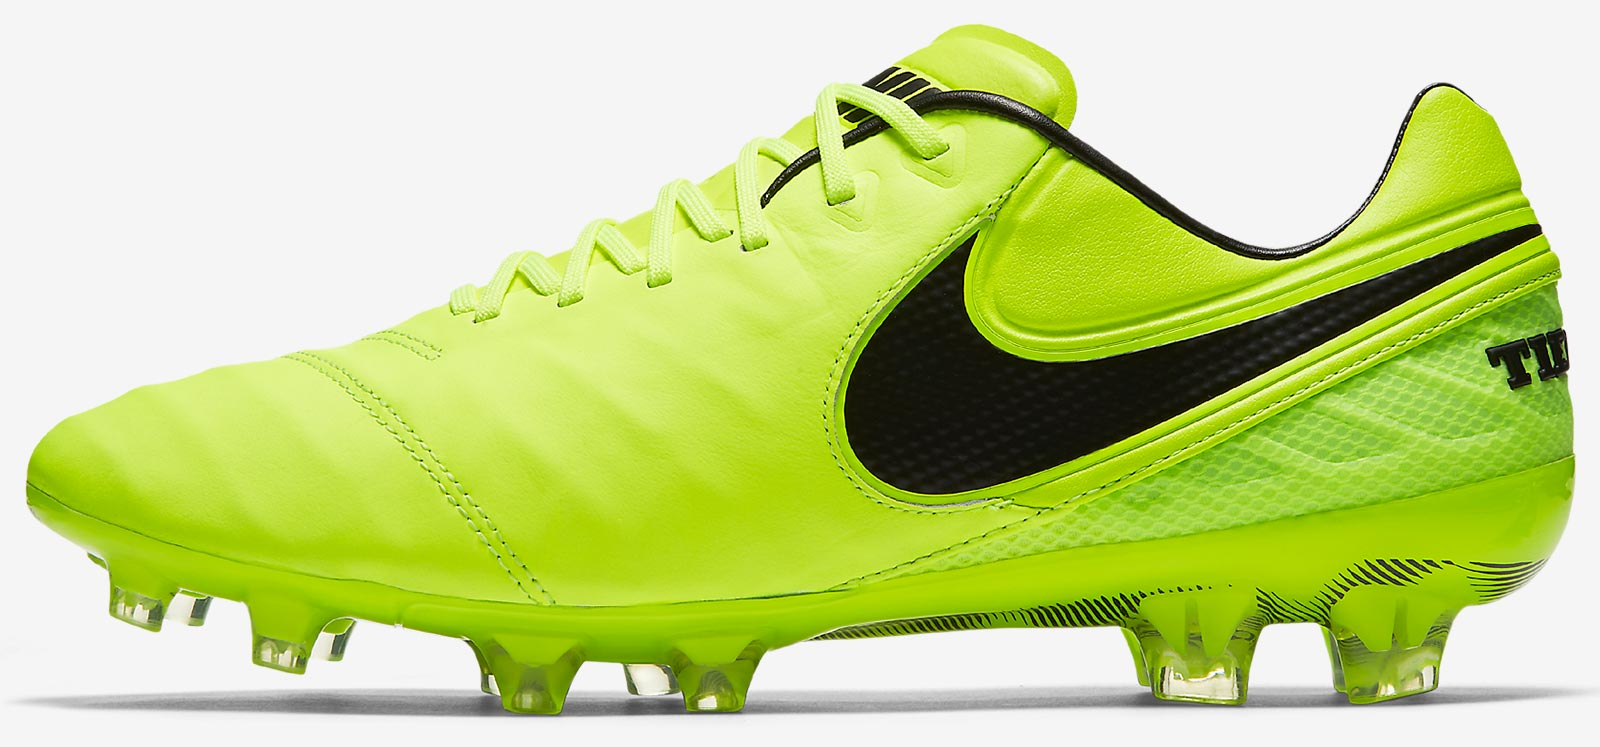 timeless design 6478b 52b21 Ryan Schofield Football Boots